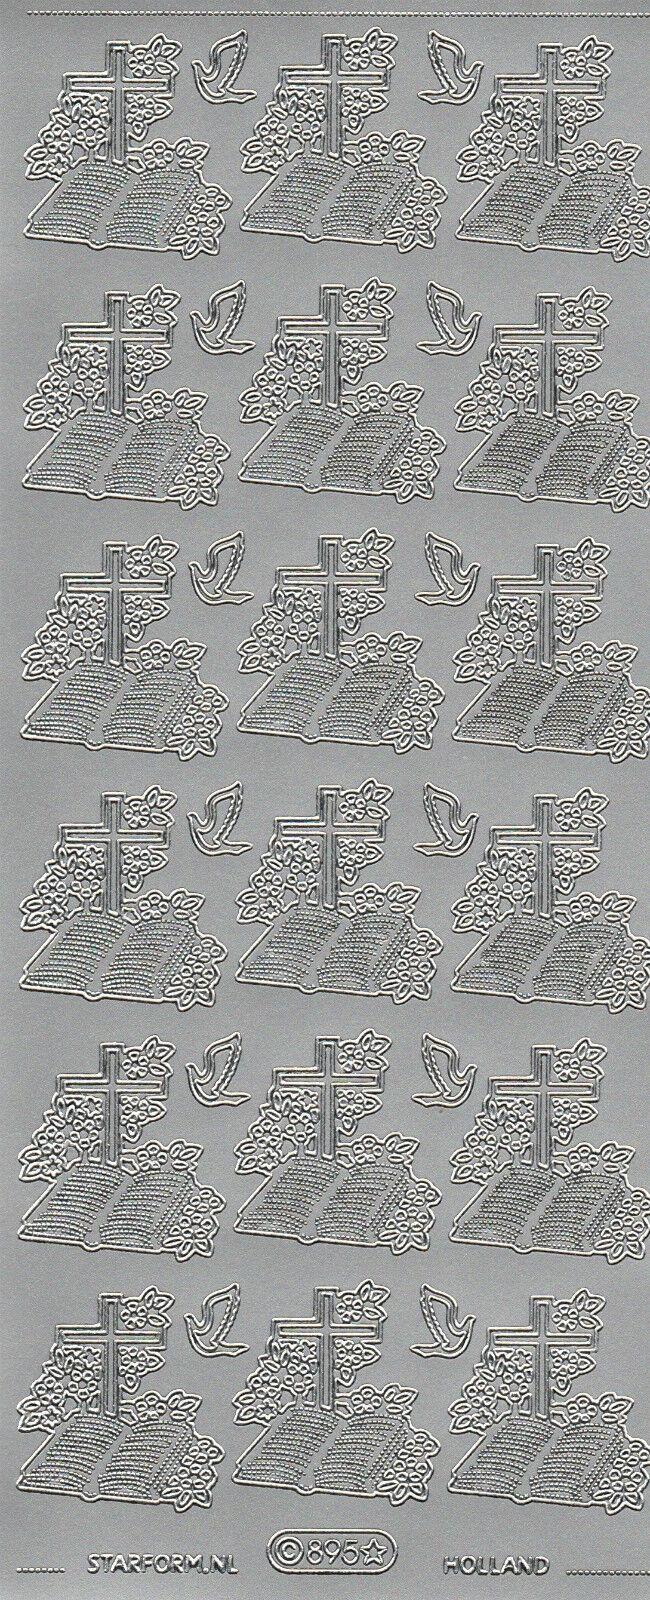 Starform Outline Stickers N° 895 Bible /& Croix Communion Auto-collant Pell Offs